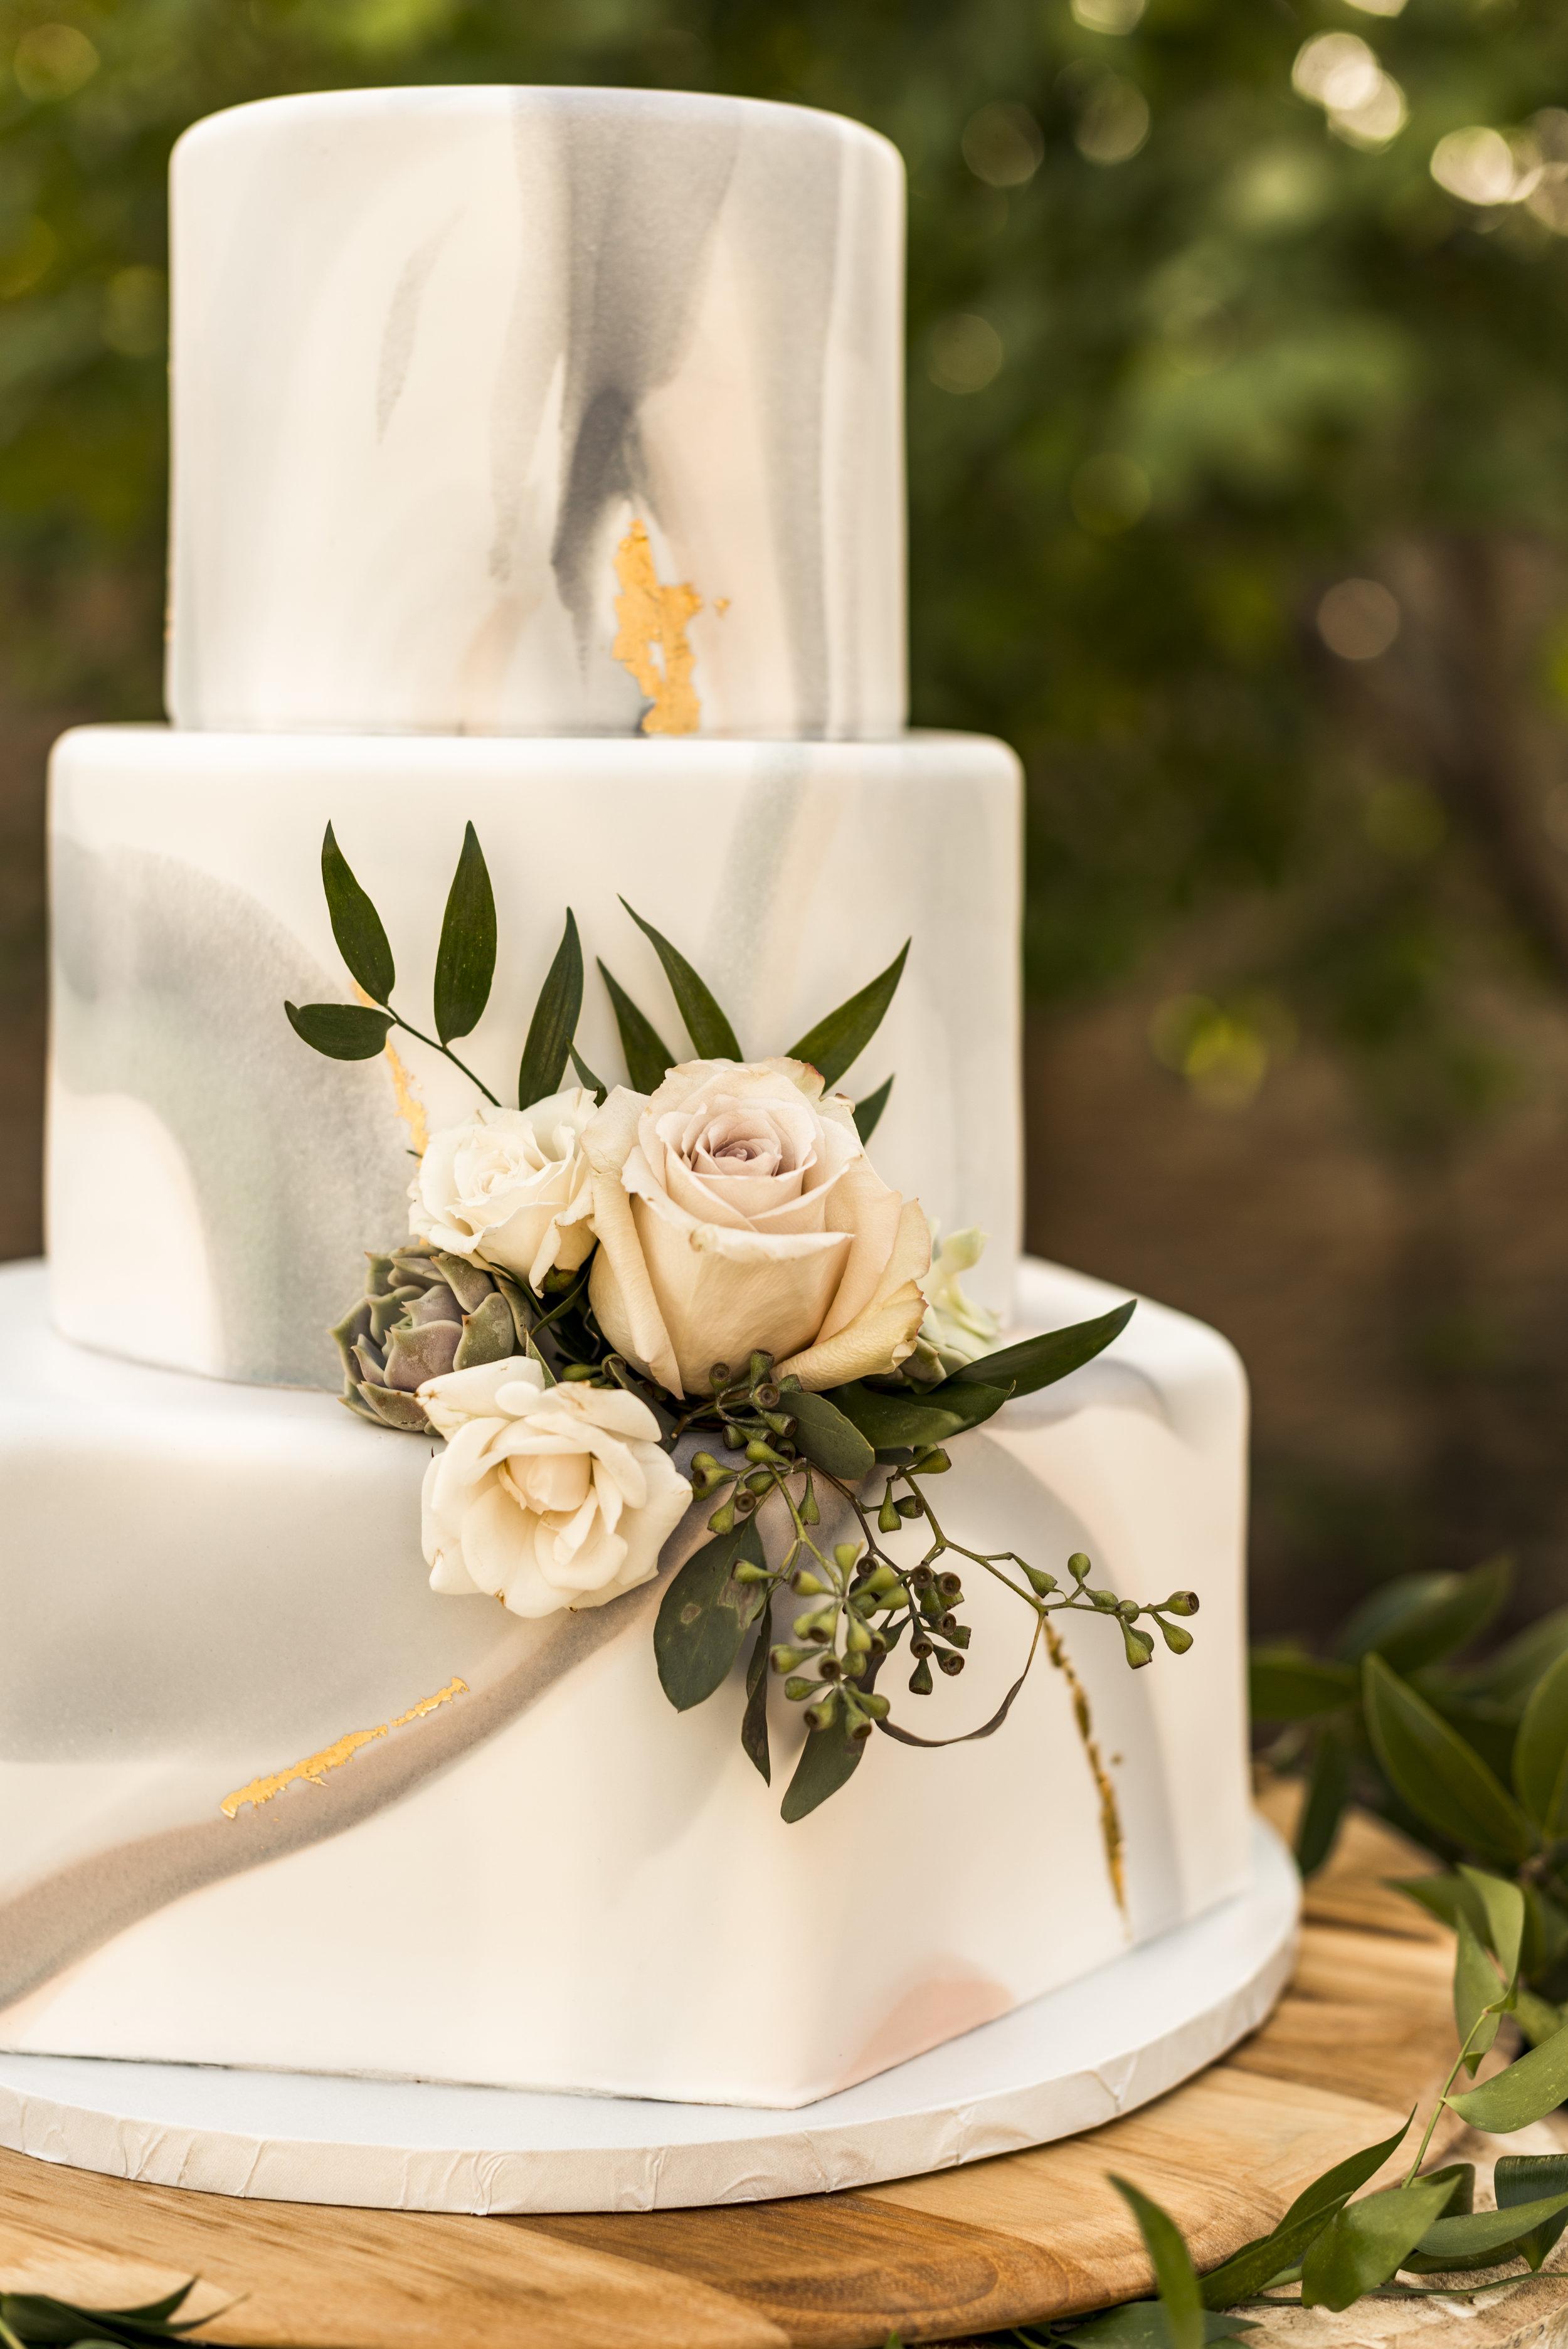 LDS Summer Wedding | South Jordan, Utah Wedding Photographer| Bri Bergman Photography 16.JPG